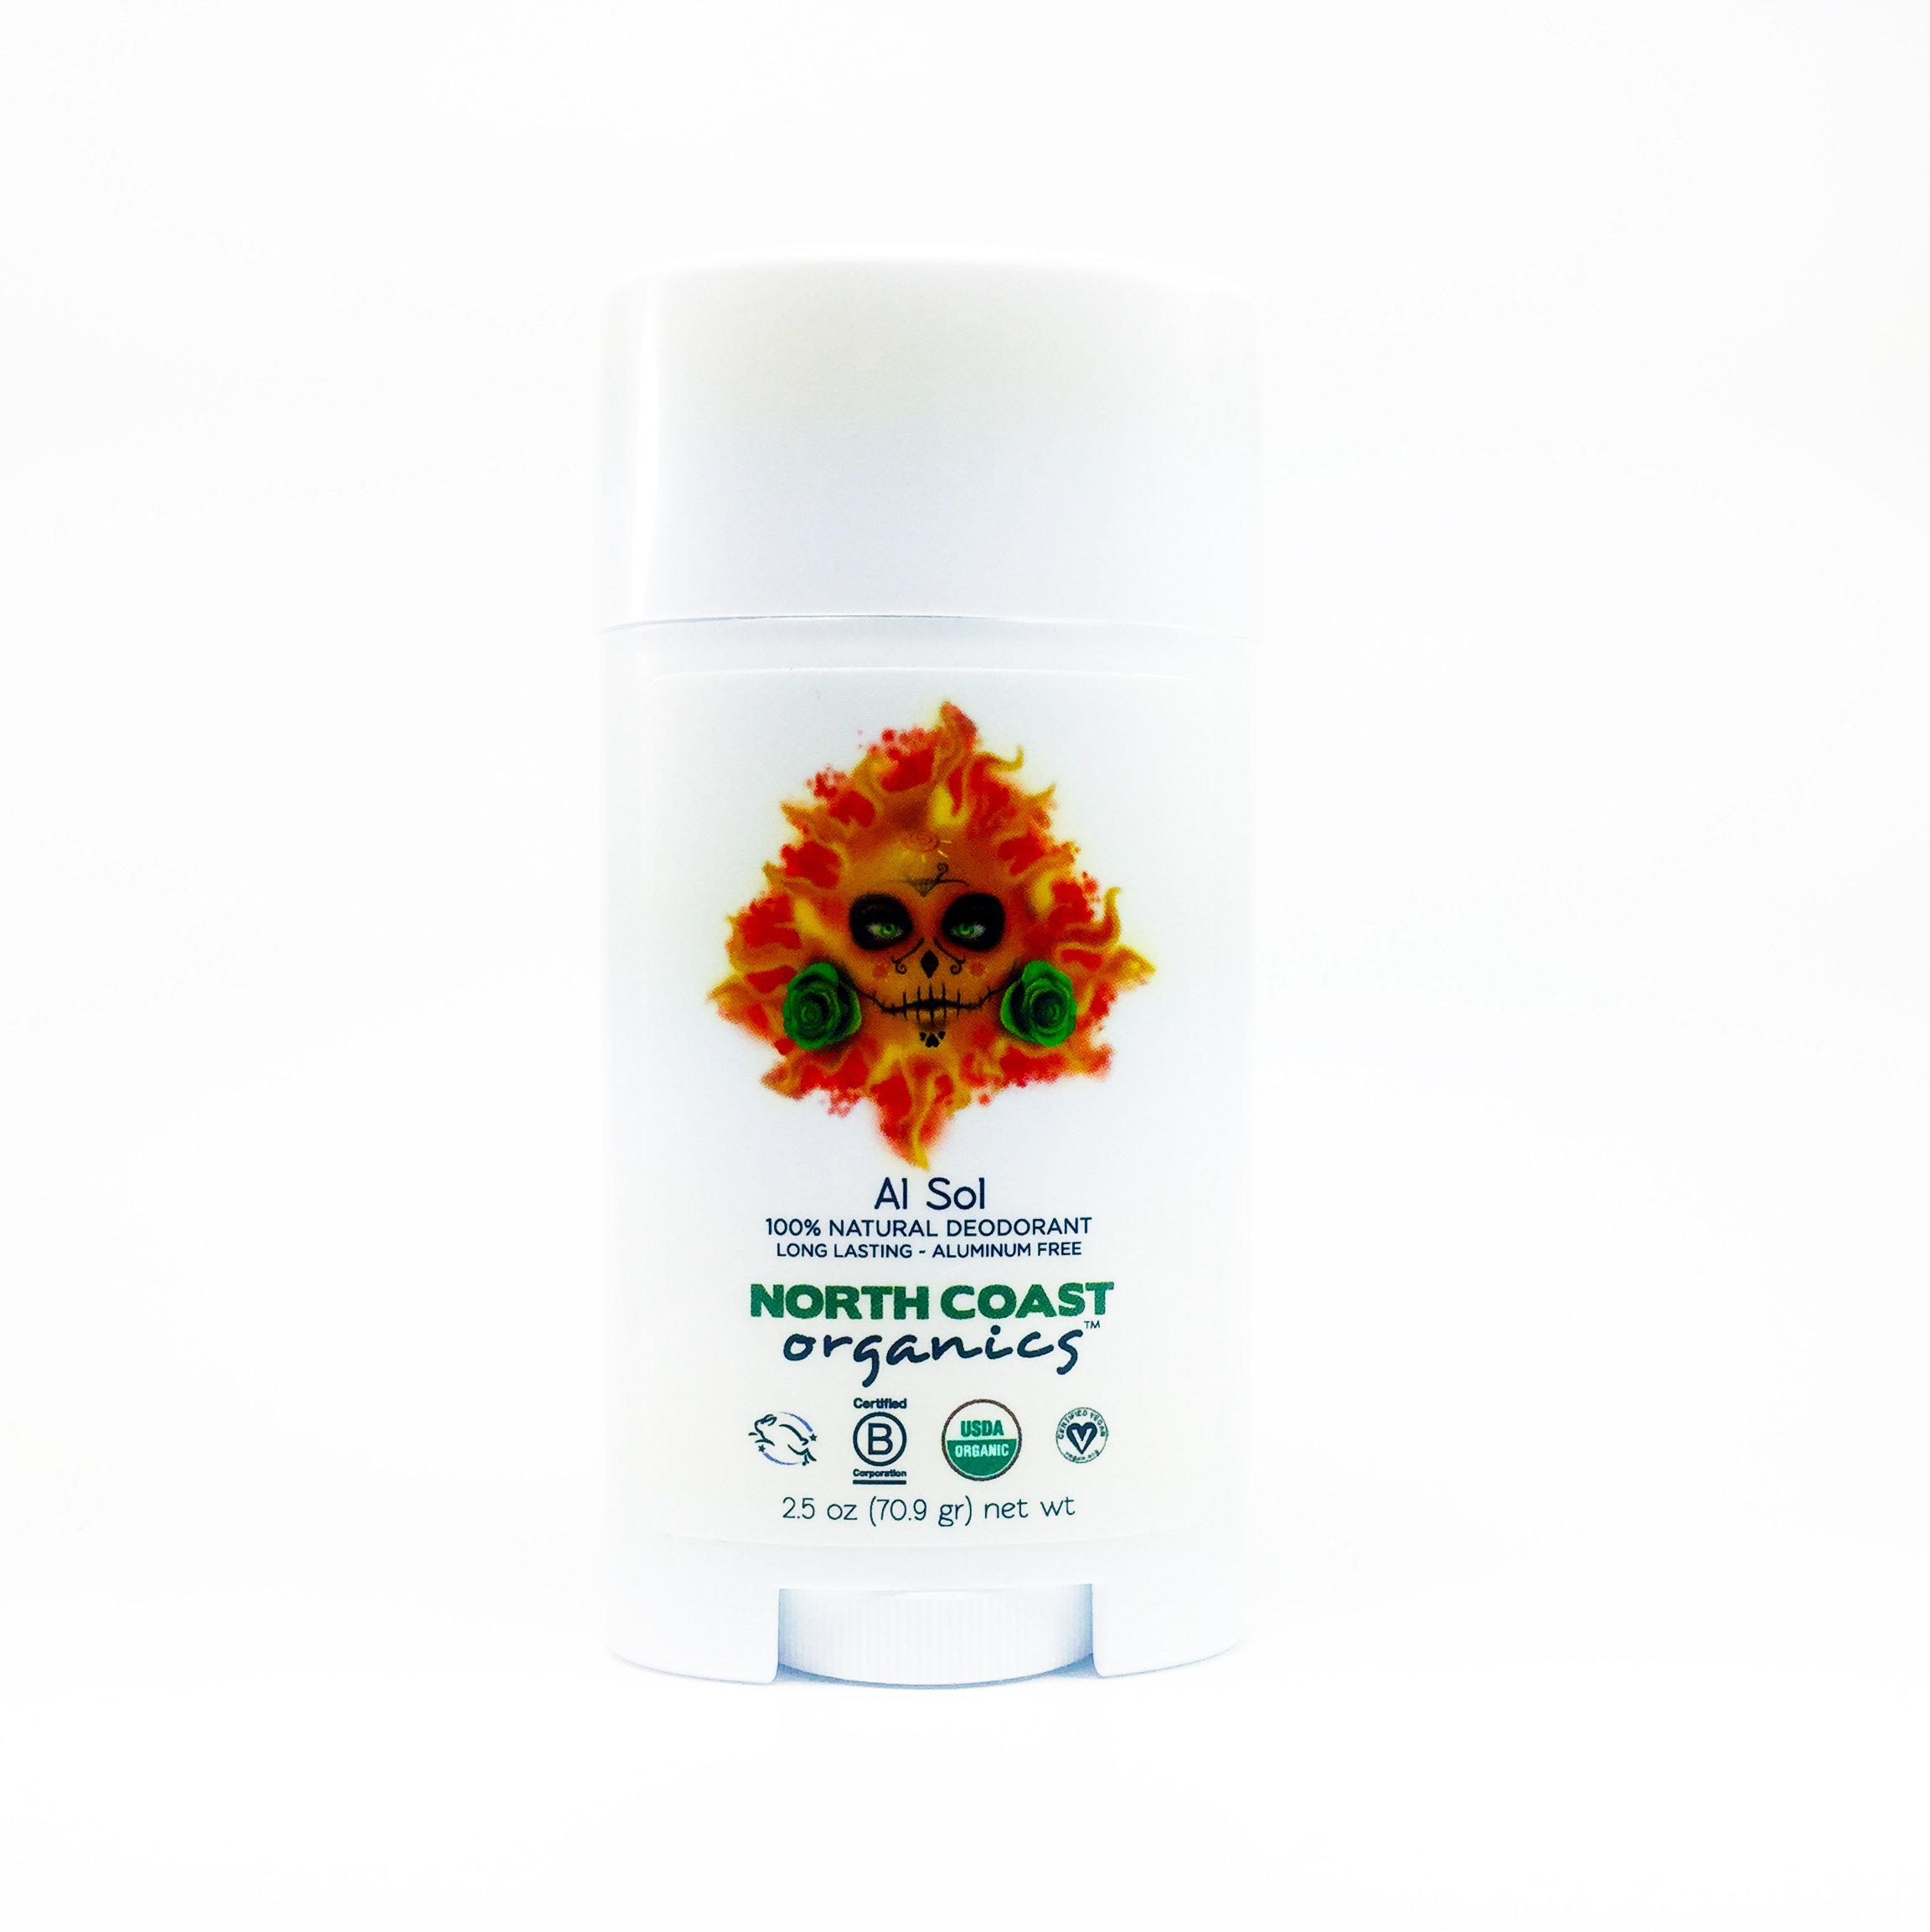 AL SOL - Organic Deodorant 2.5oz 1004